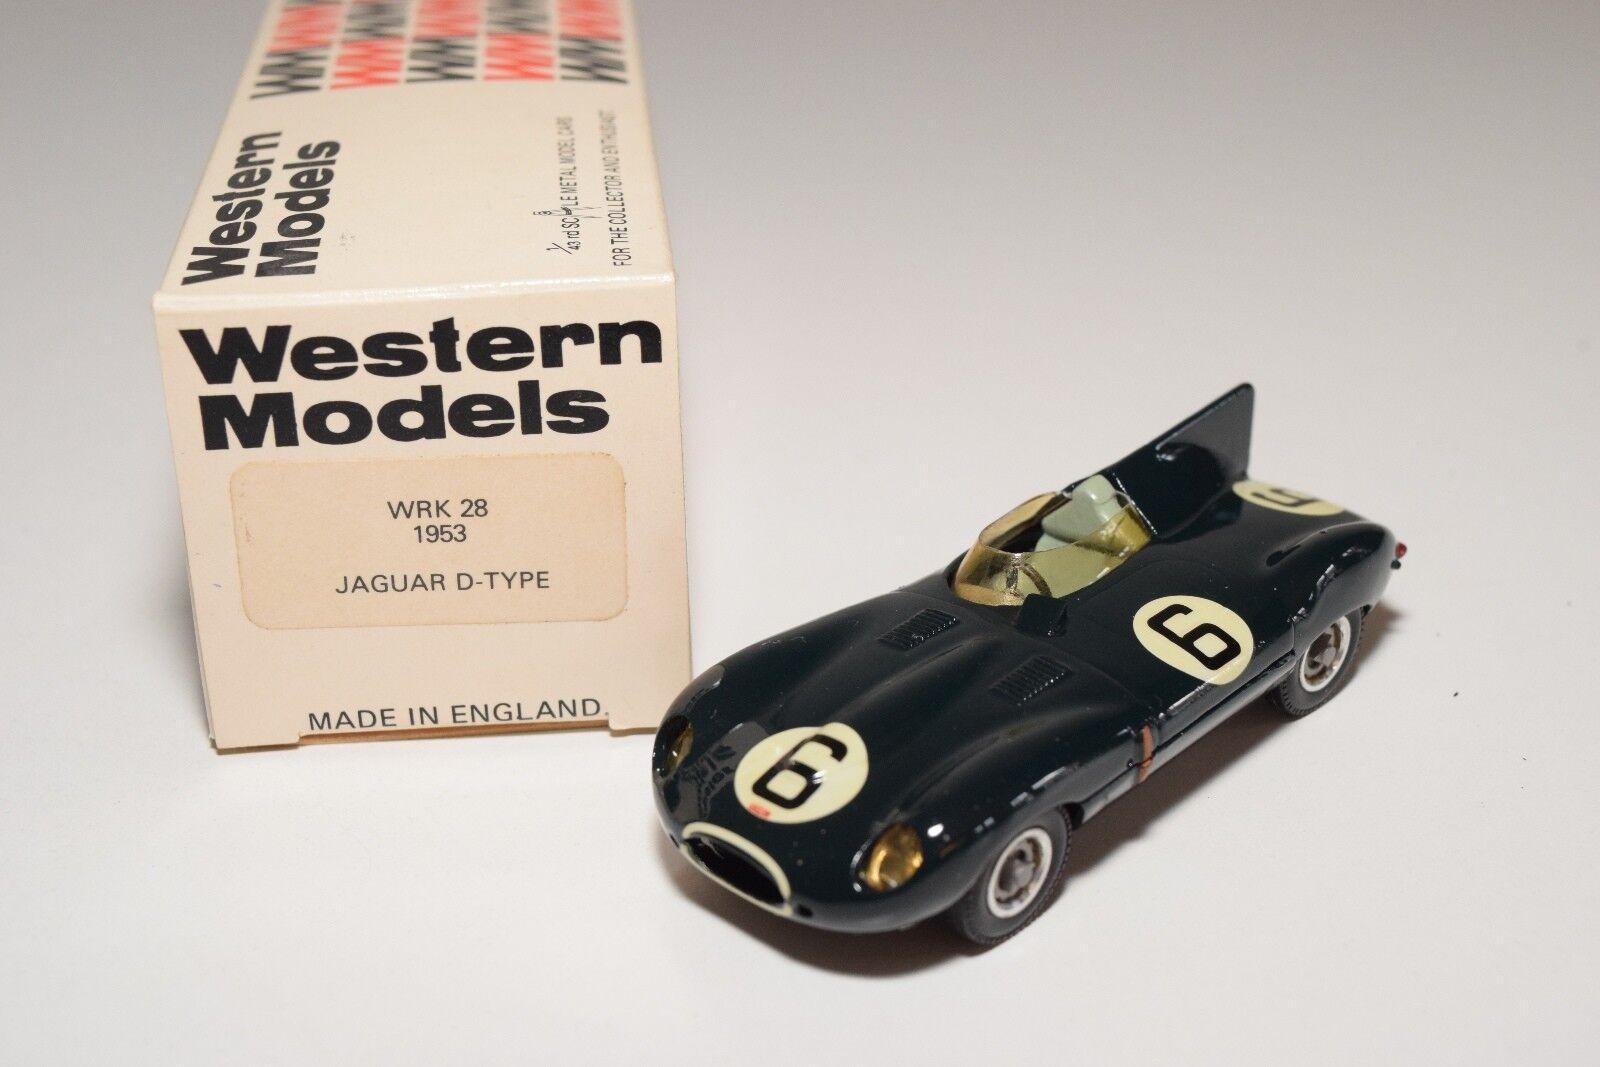 molte concessioni I I I WESTERN modelloS WM WRK 28 JAGUAR D-TYPE LE uomoS 1953 DARK verde MINT scatolaED  presa di fabbrica